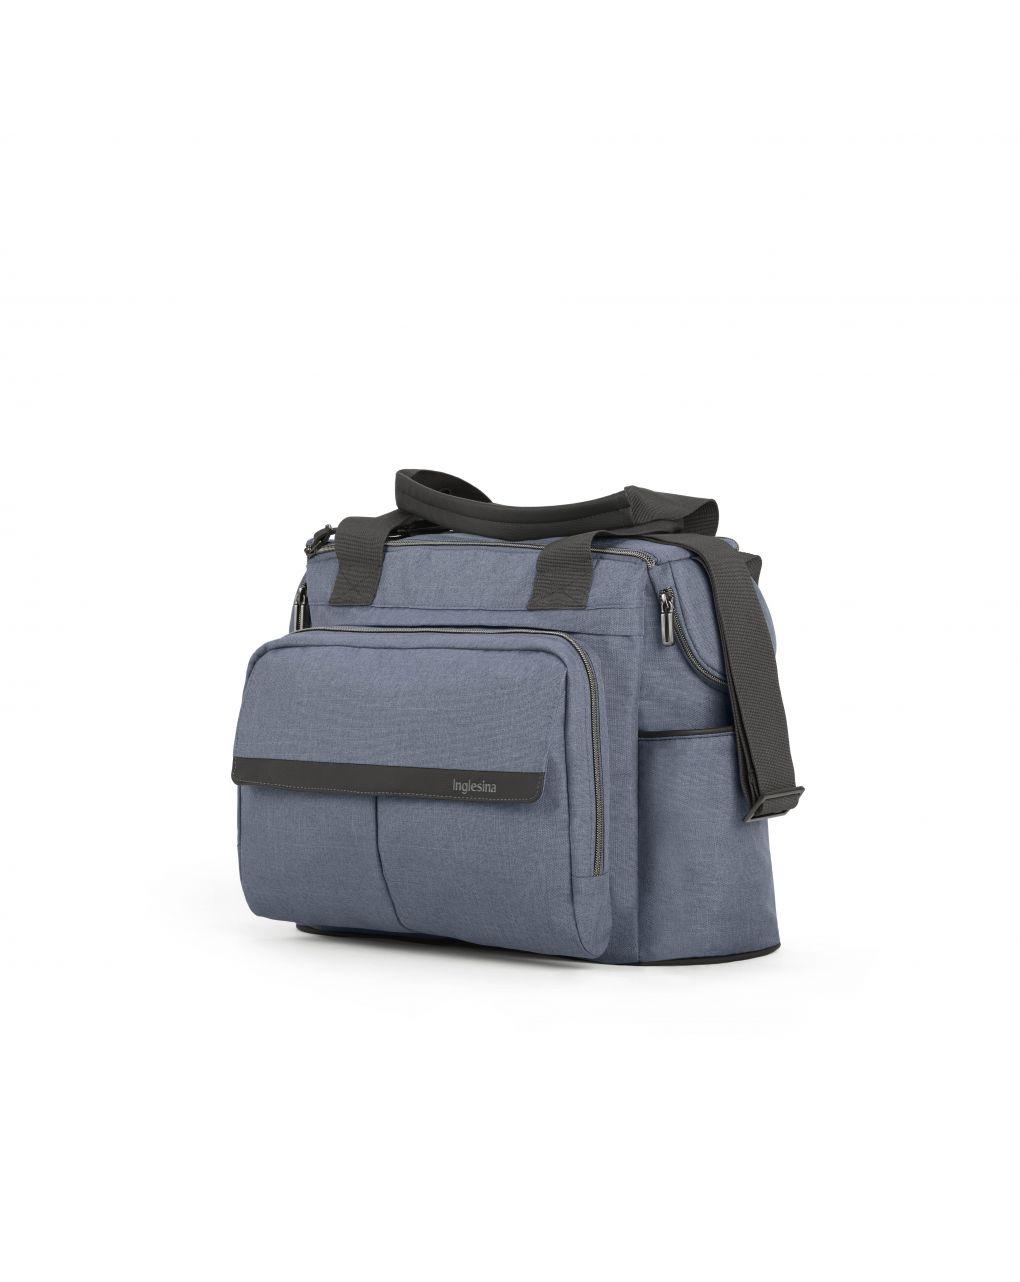 Inglesina aptica dual bag, alaska blue - Inglesina